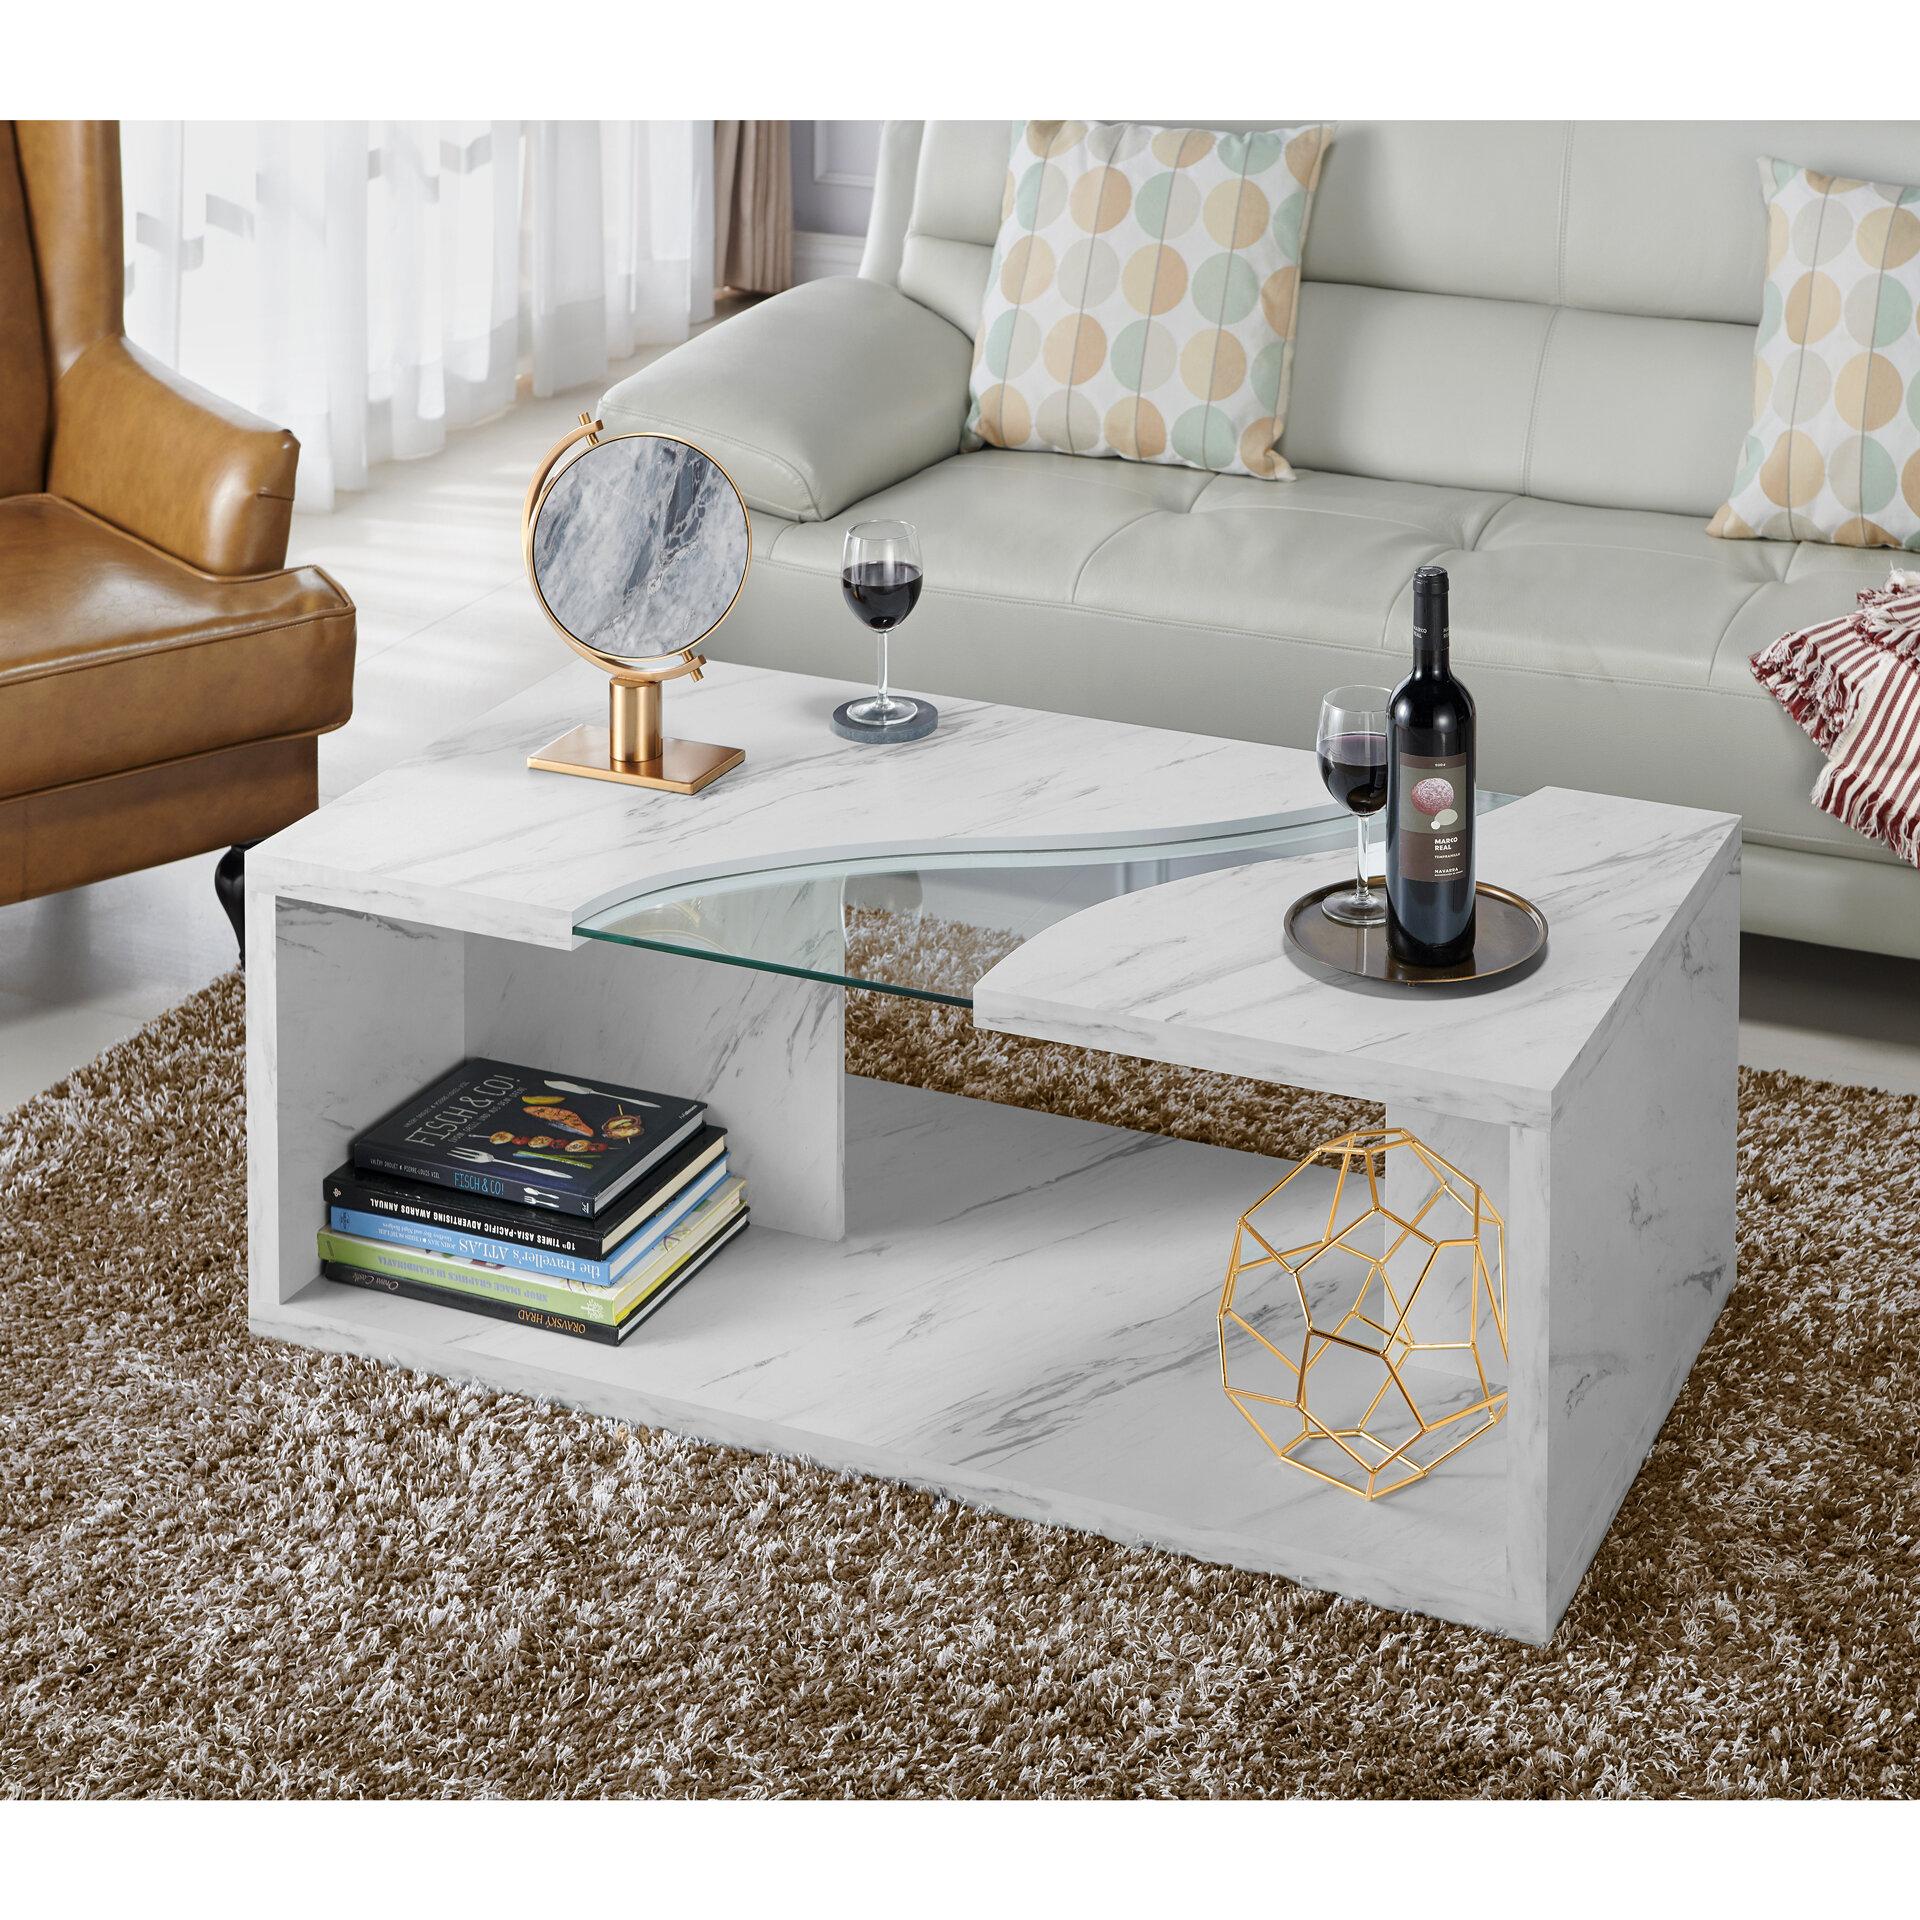 Hahn Floor Shelf Coffee Table